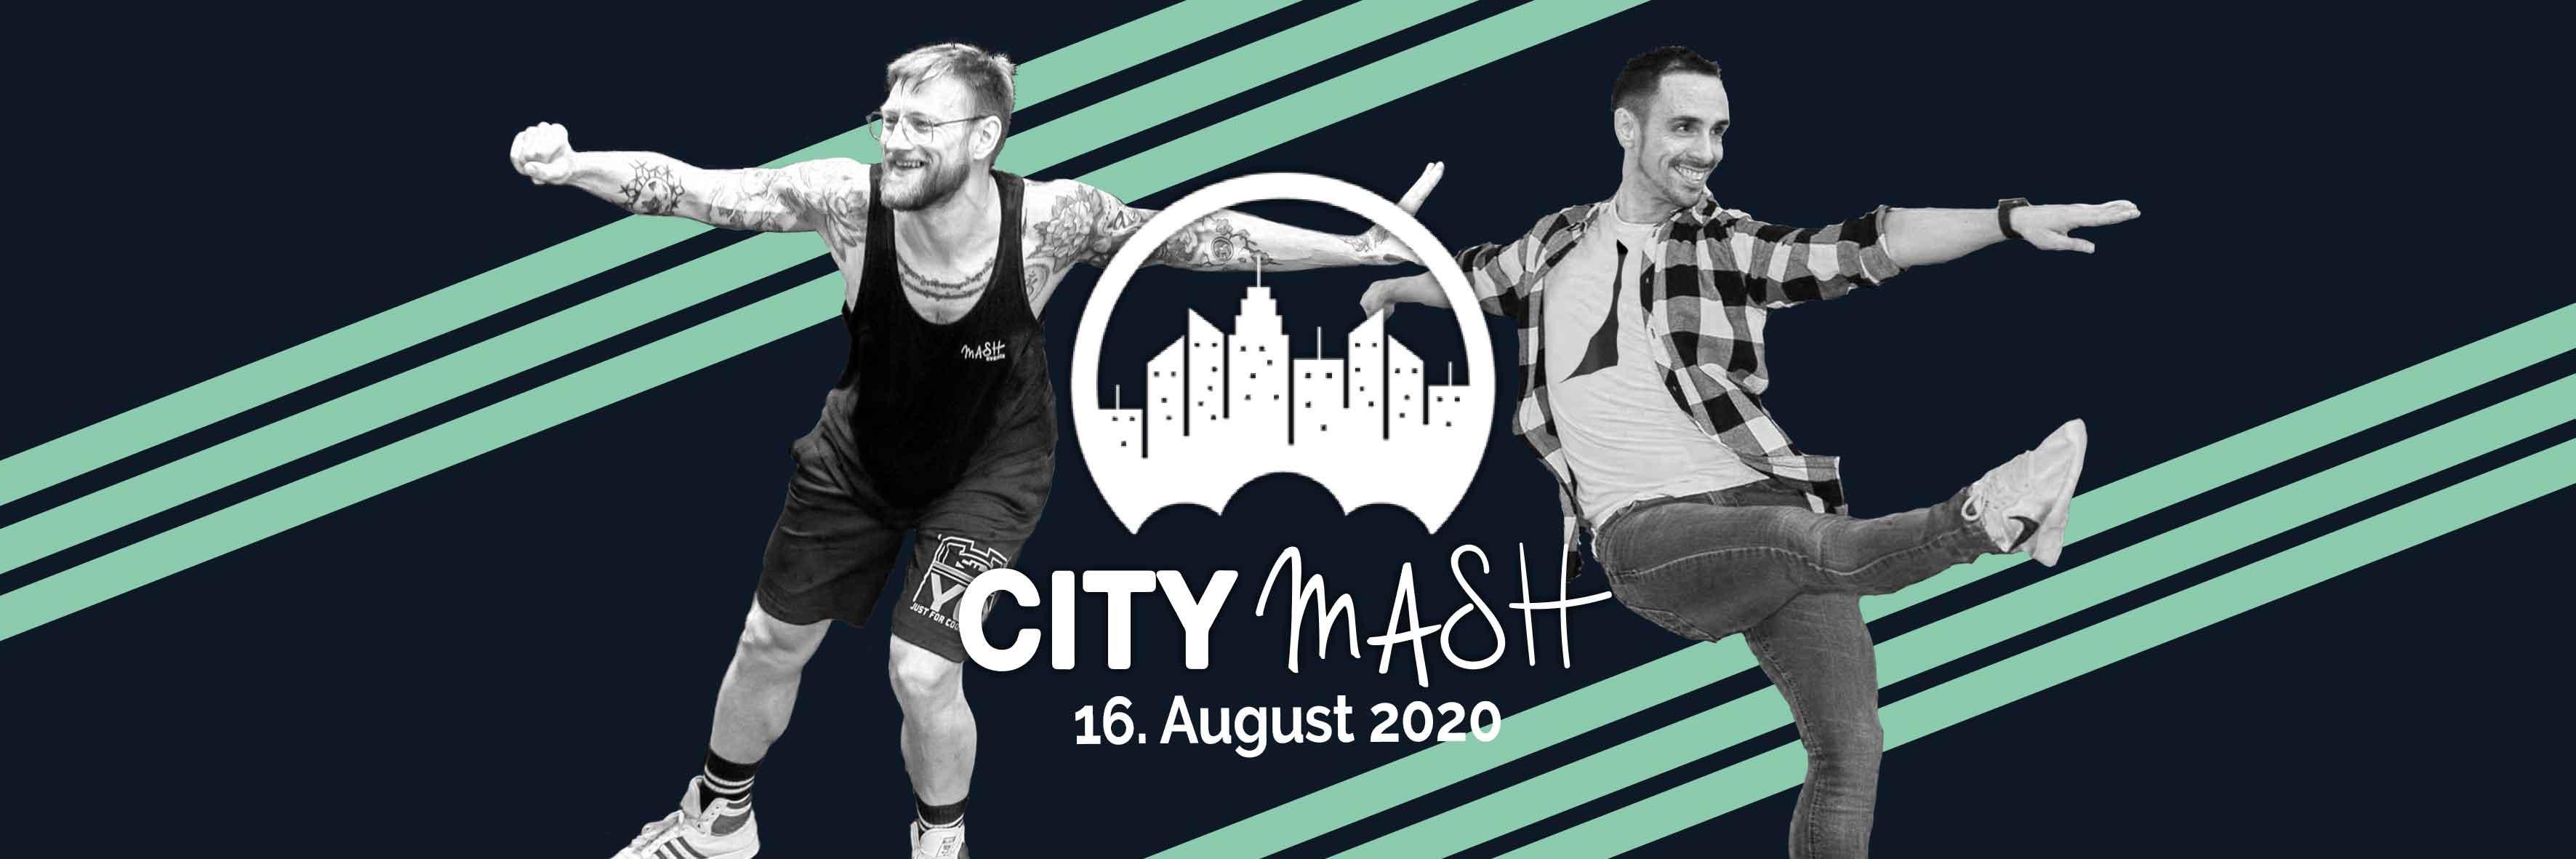 citymash-16.8.20